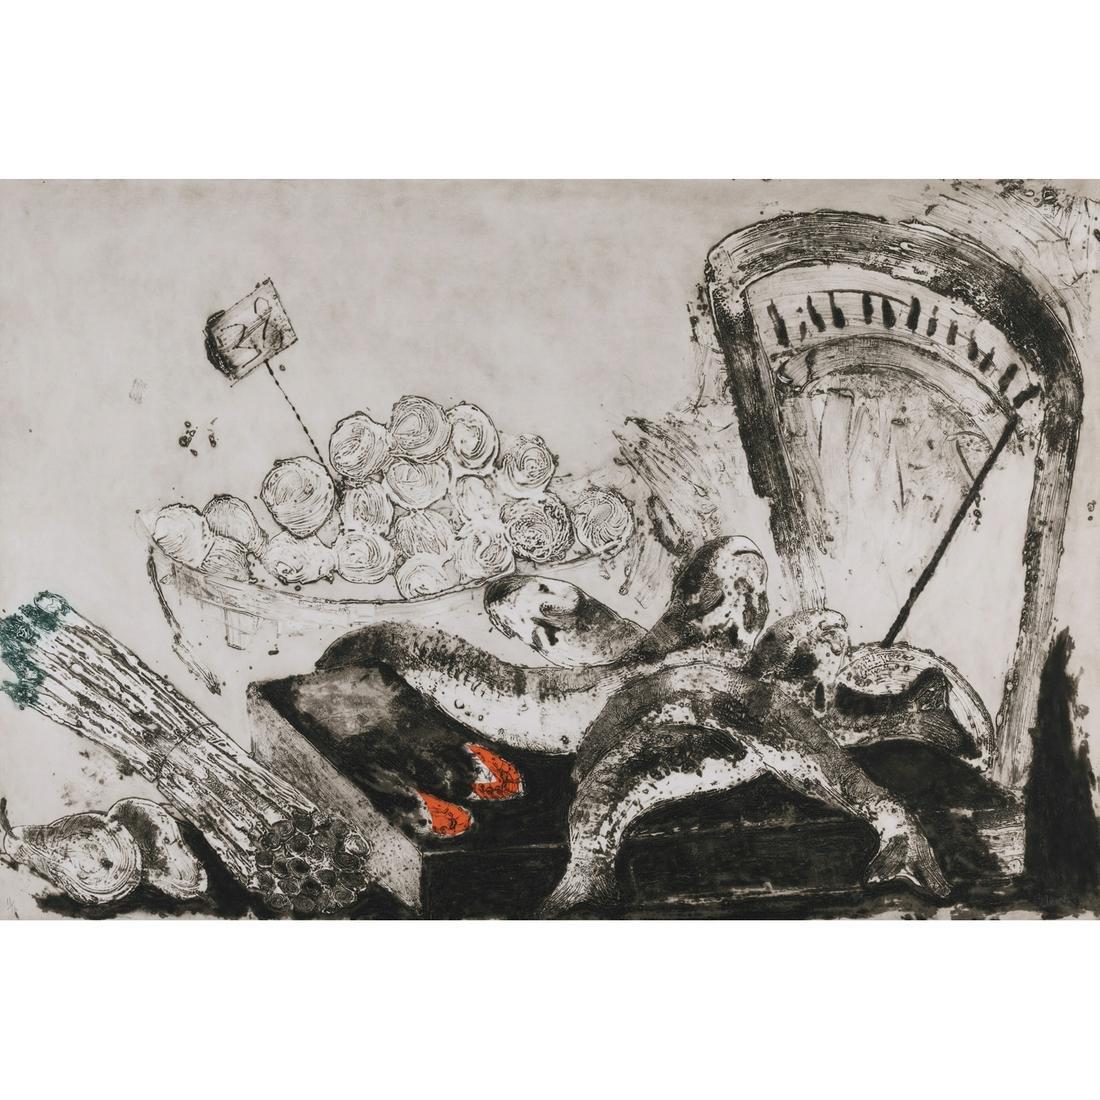 Miquel Barcelo (born 1957) La balance - 1987